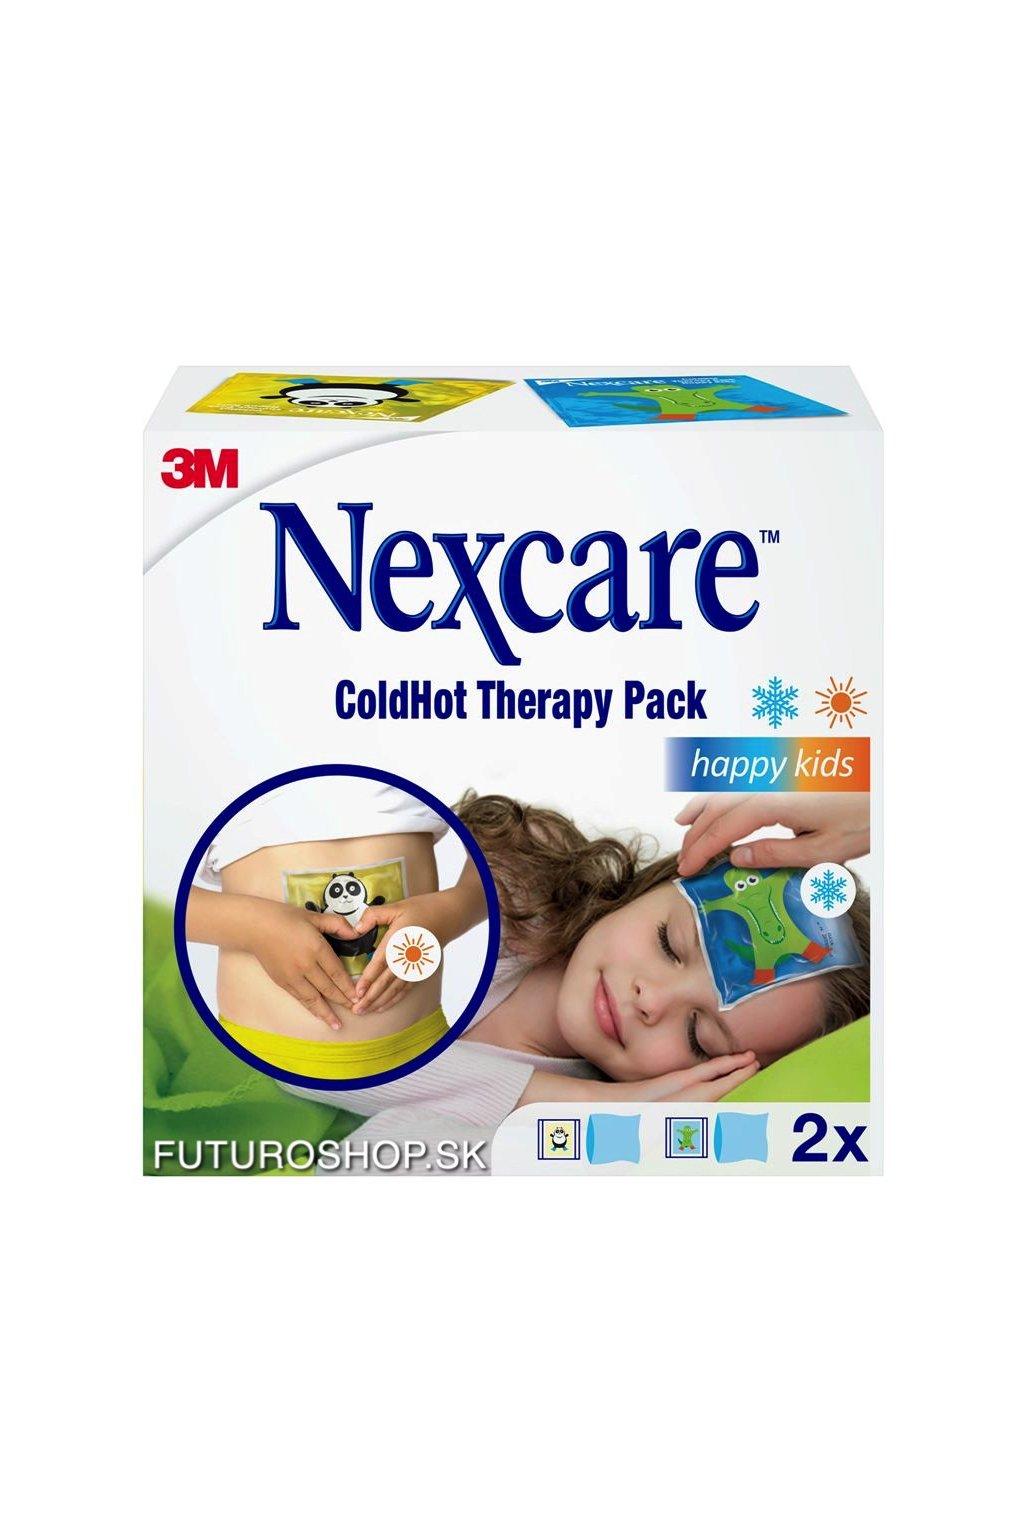 3M Nexcare Coldhot Happy Kids